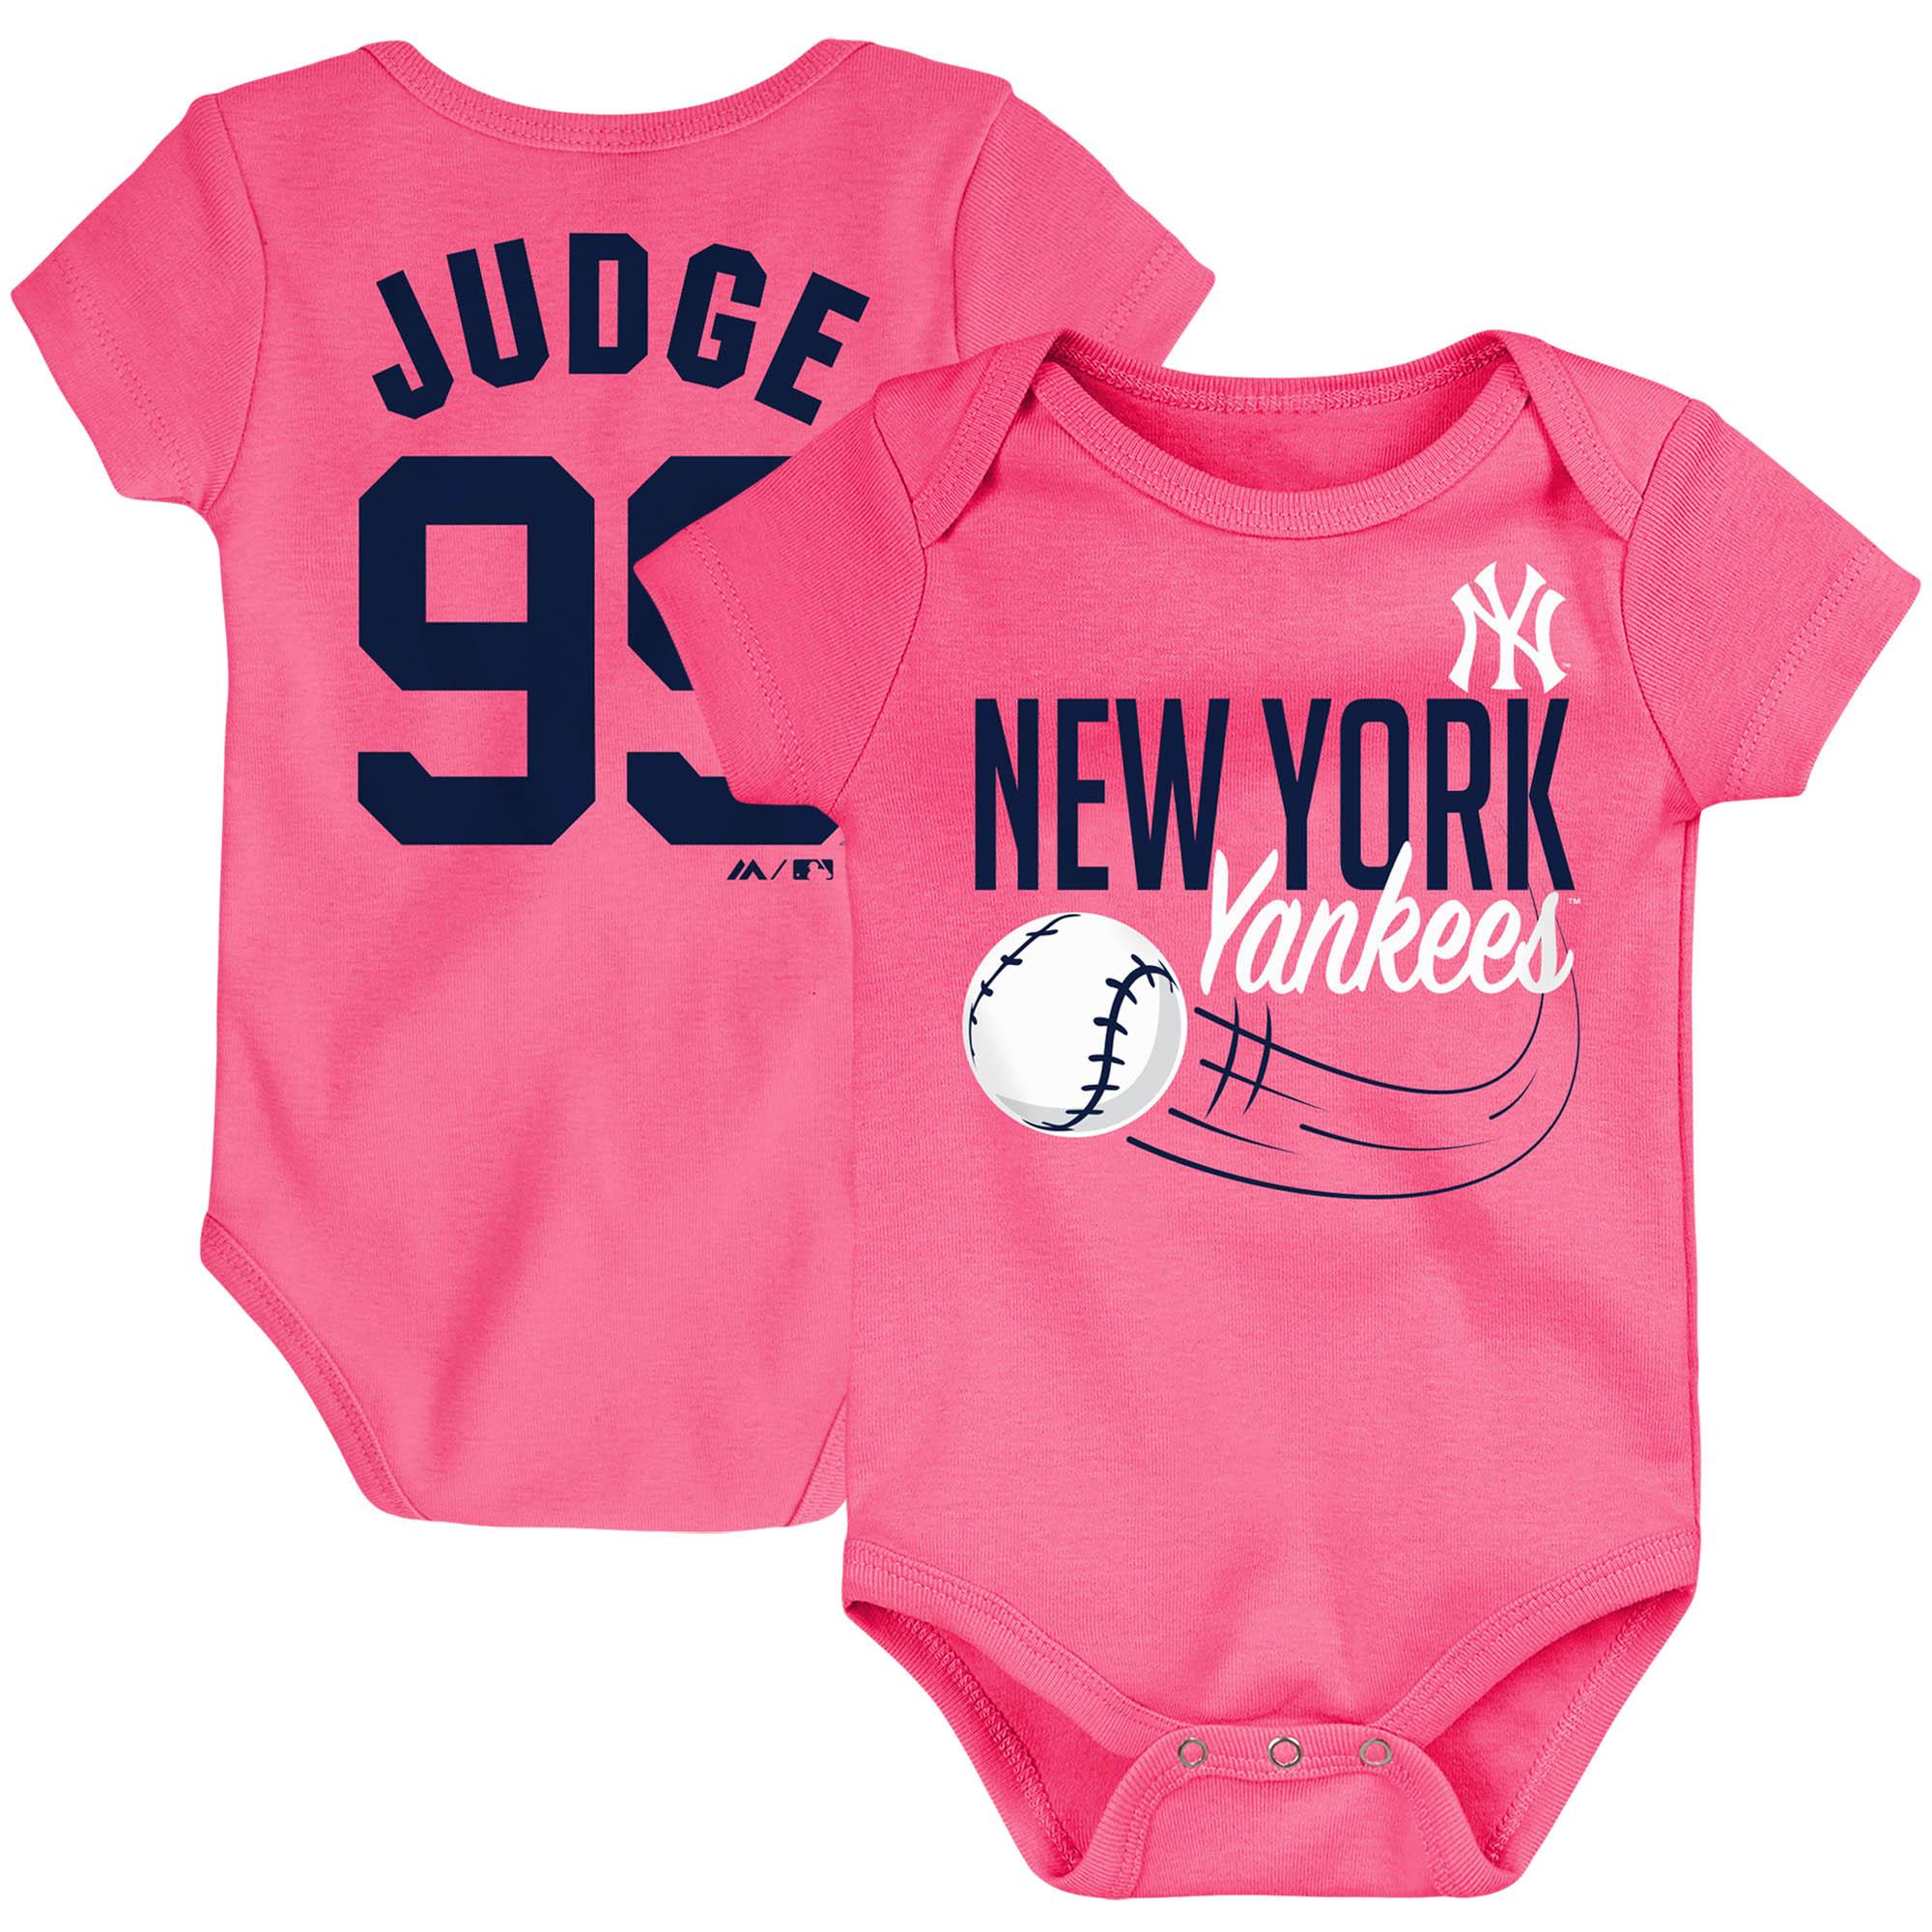 Aaron Judge New York Yankees Majestic Newborn & Infant Baby Slugger Name & Number Bodysuit - Pink